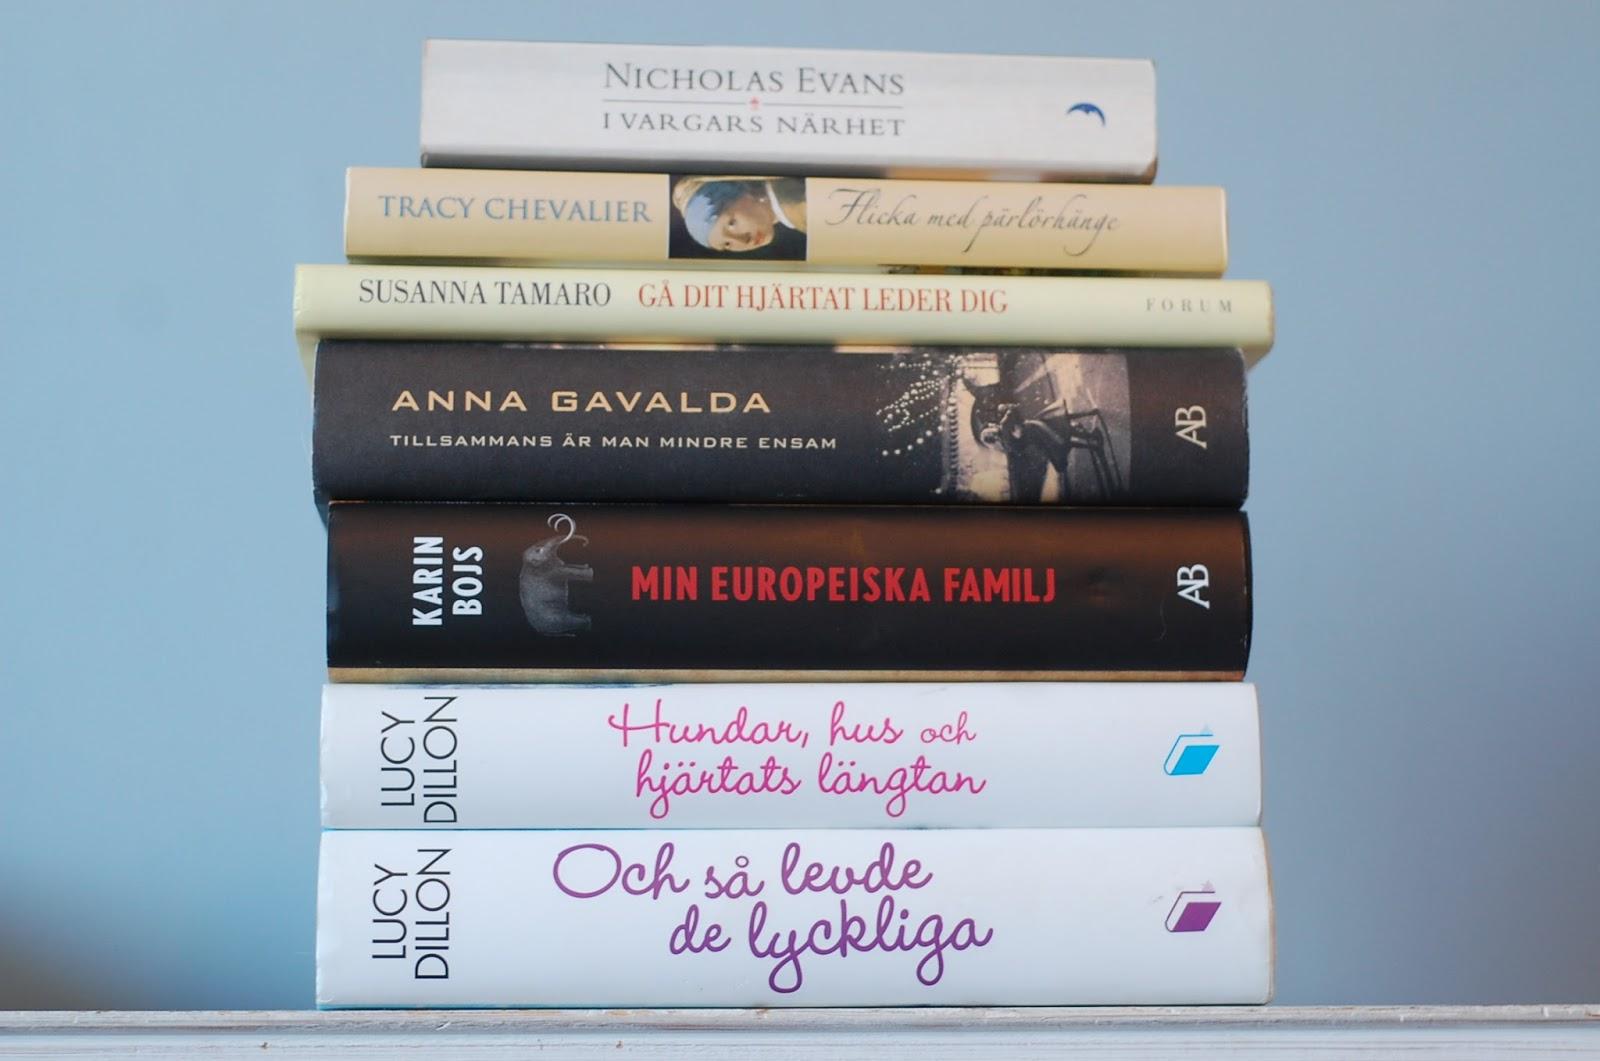 Julen liten ljusning for dalande bokhandel